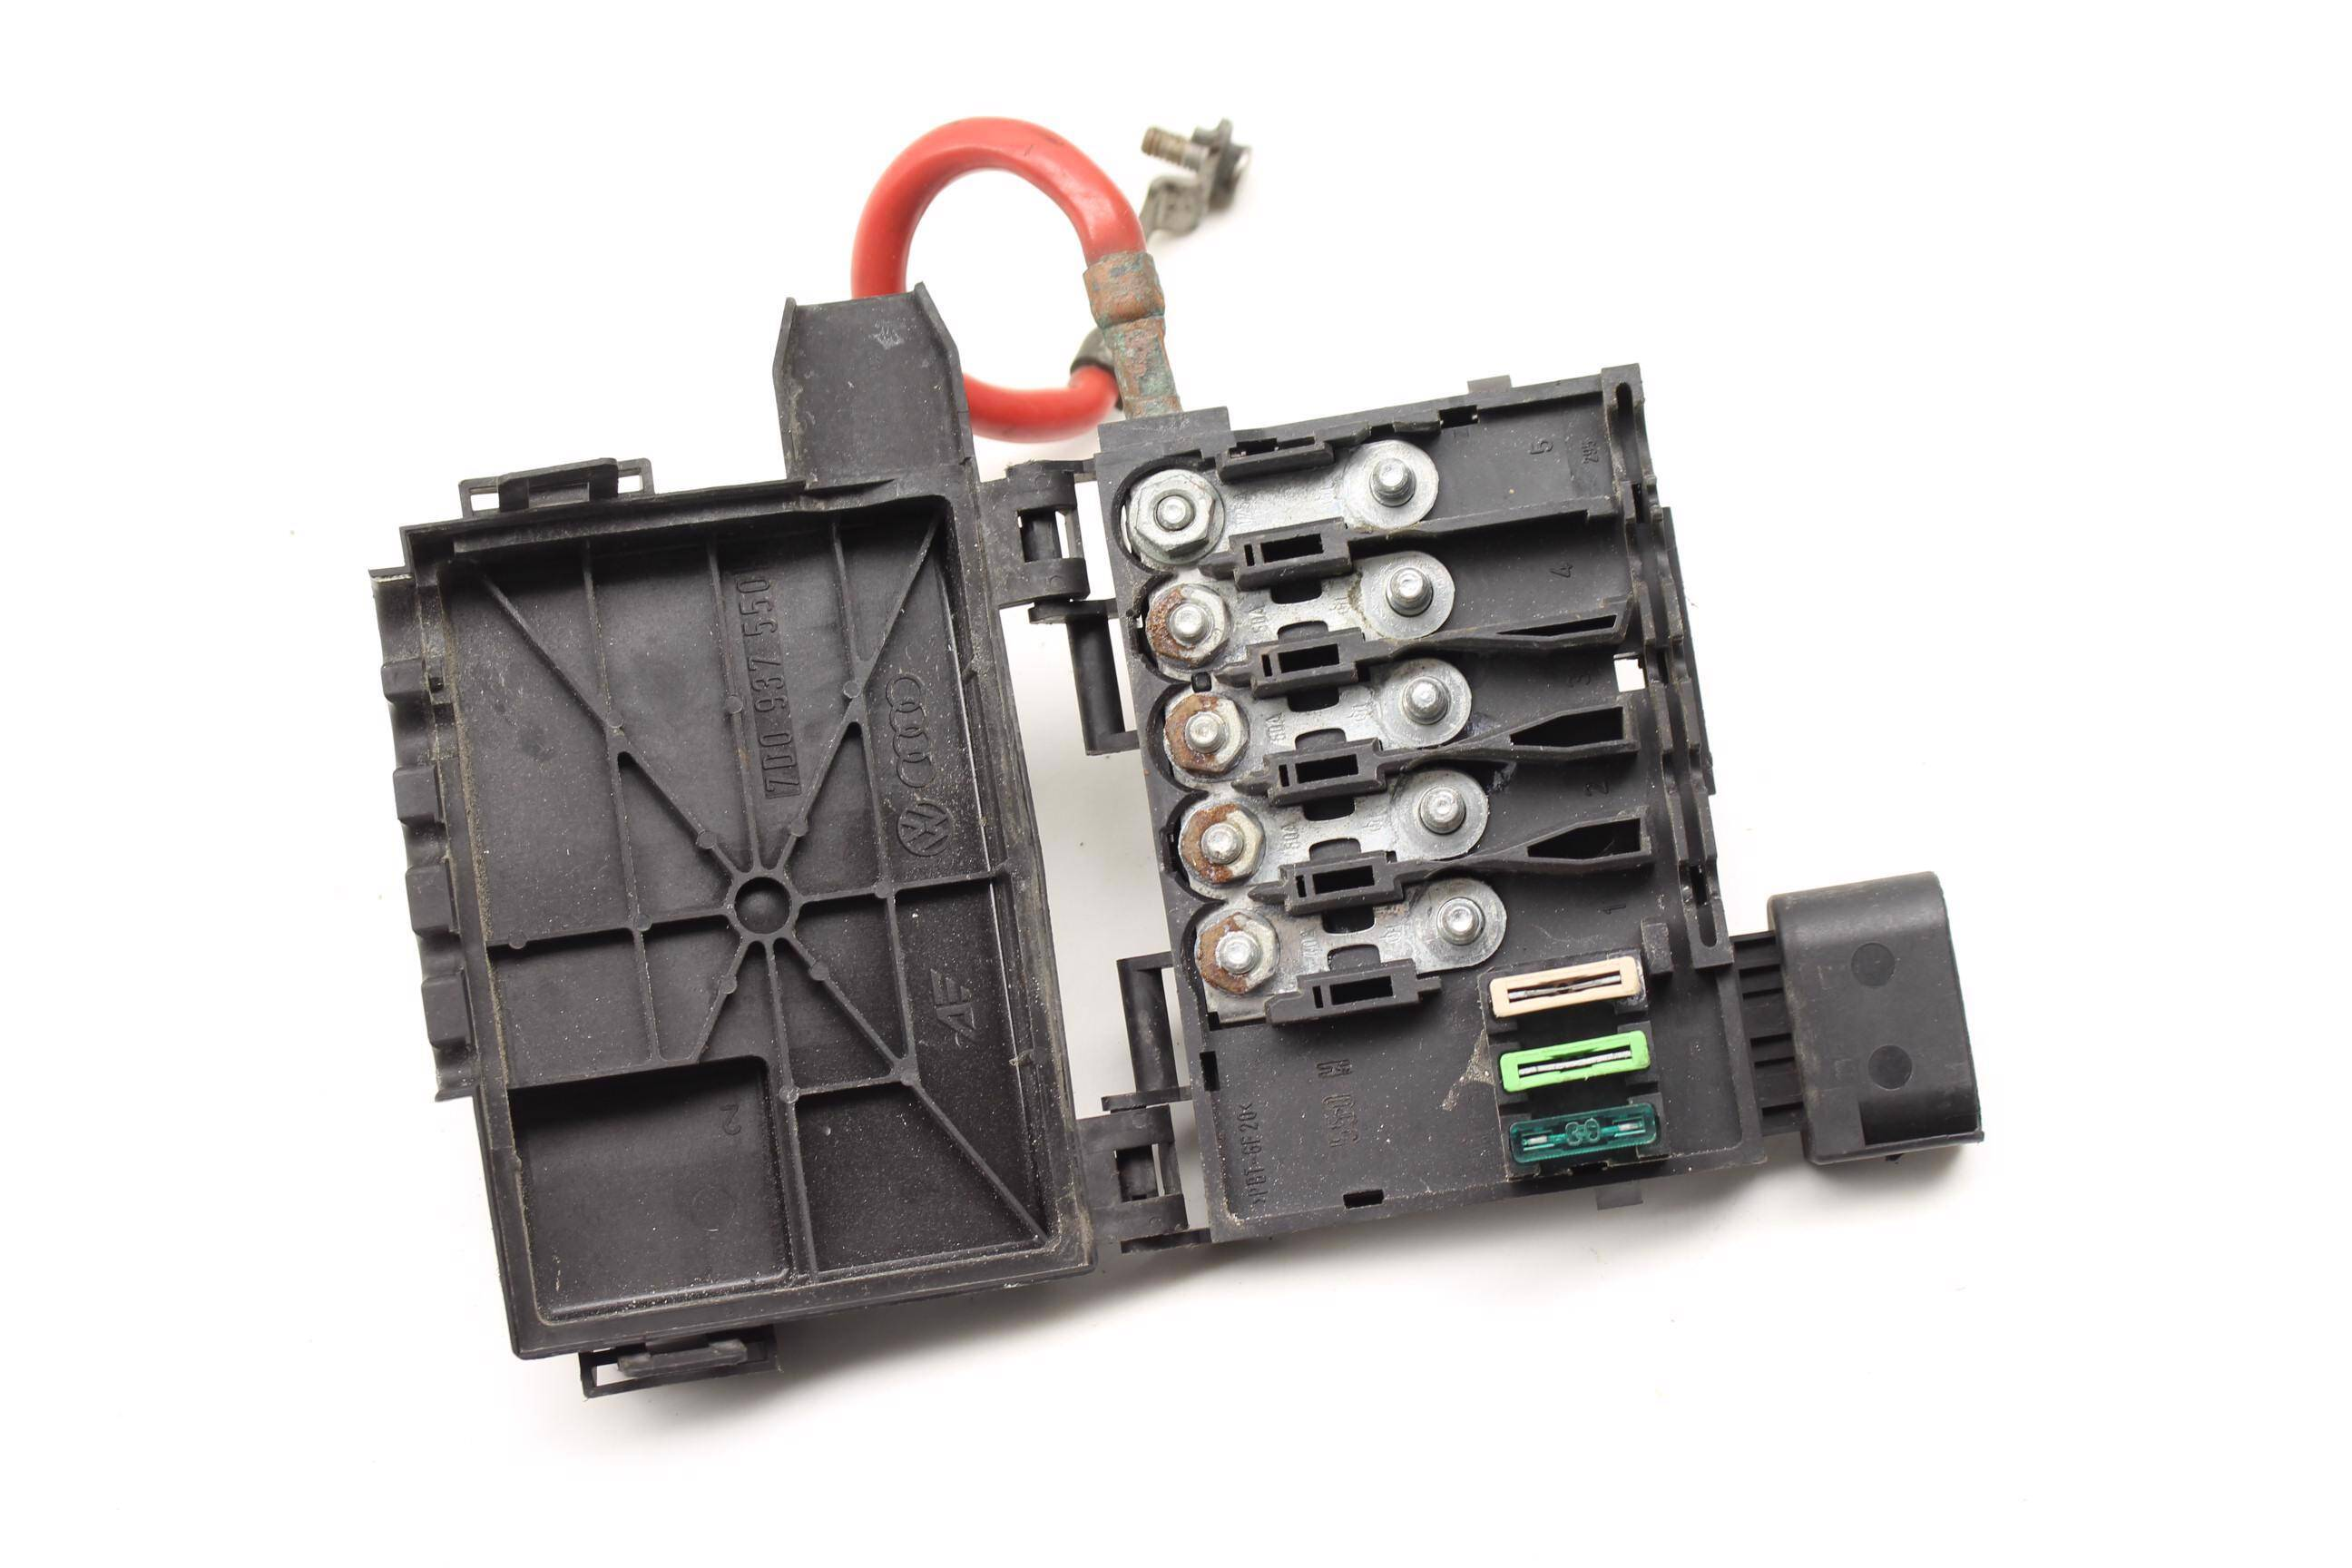 1999 2000 2001 2002 2003 vw eurovan t4 - fuse box / holder